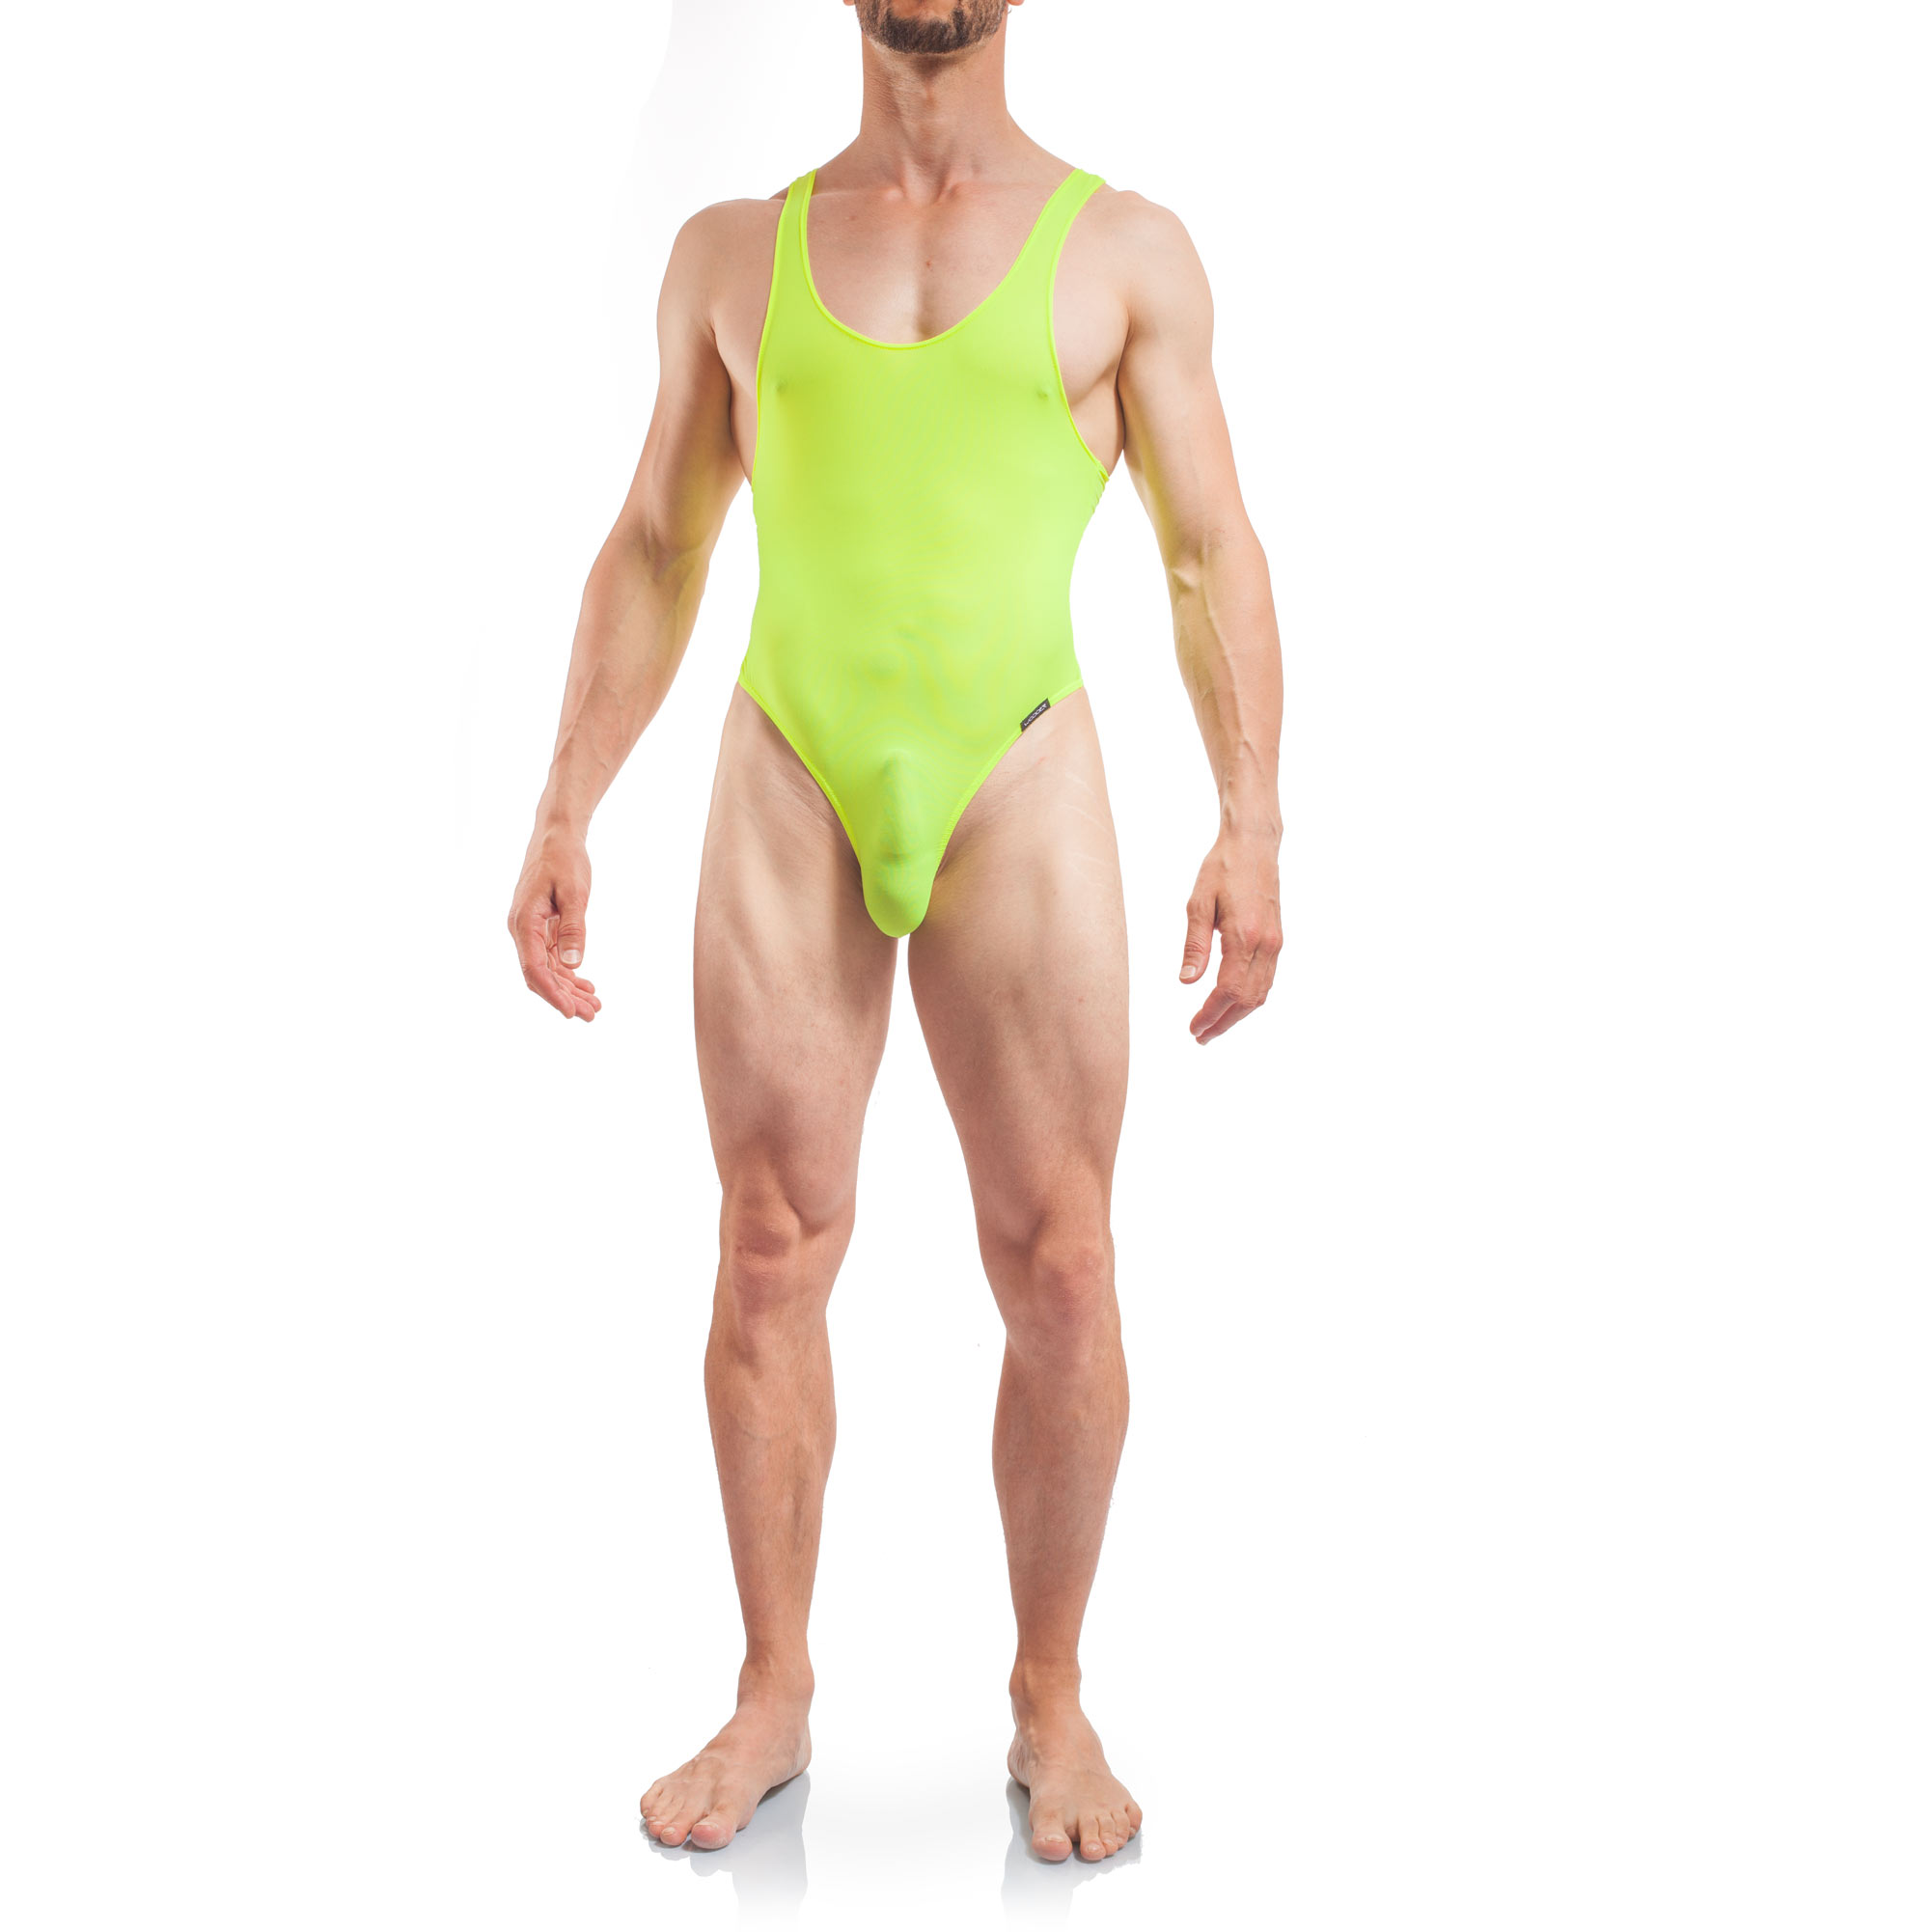 Basic Body Men, Body Badeanzug Tangabody